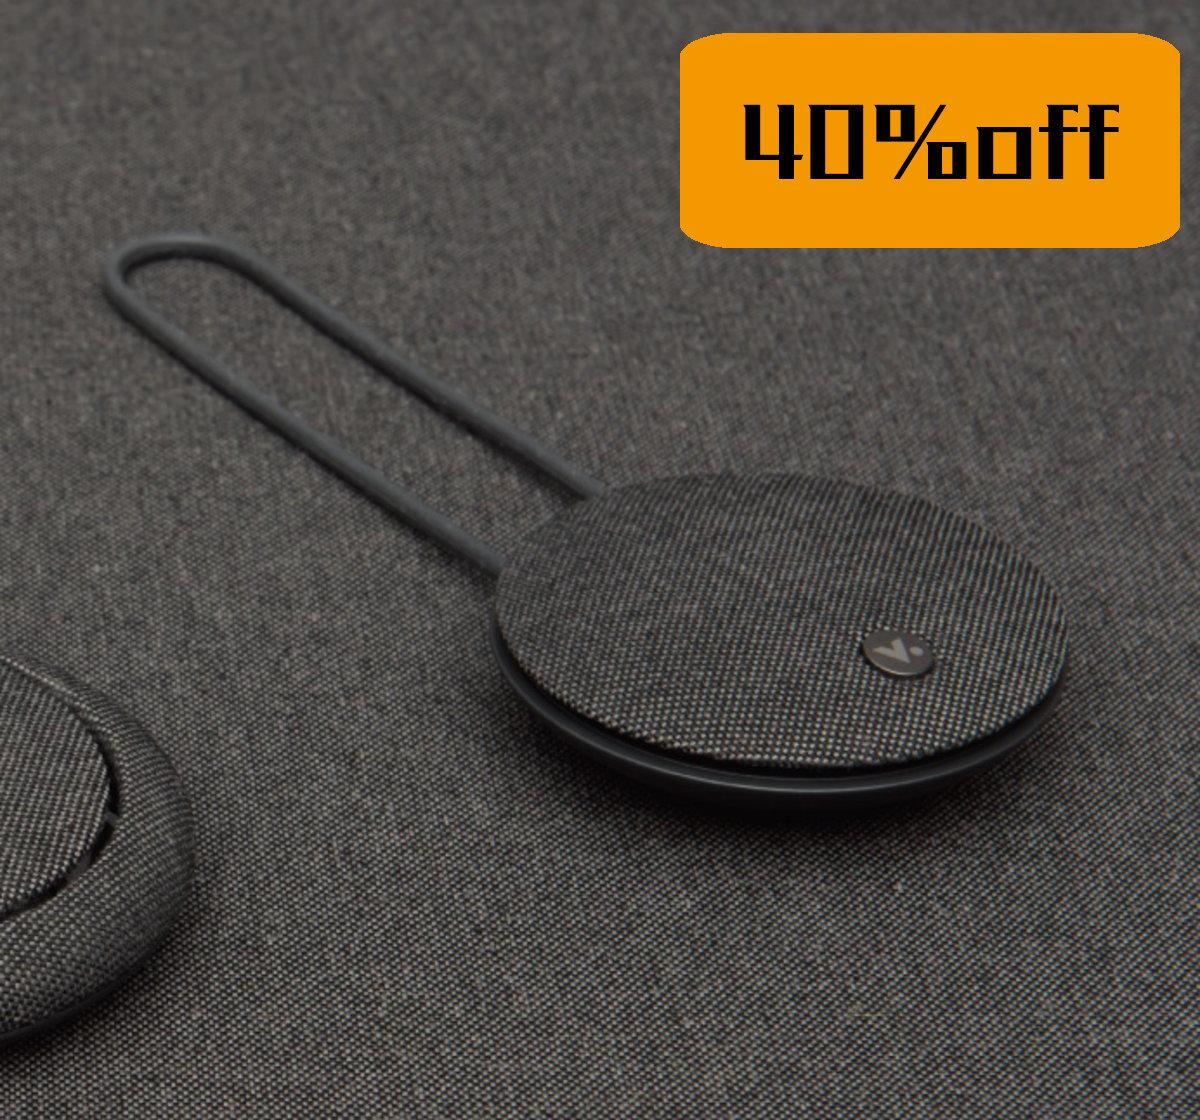 Vistic fara hanger type Car Fragrance - Black No.9